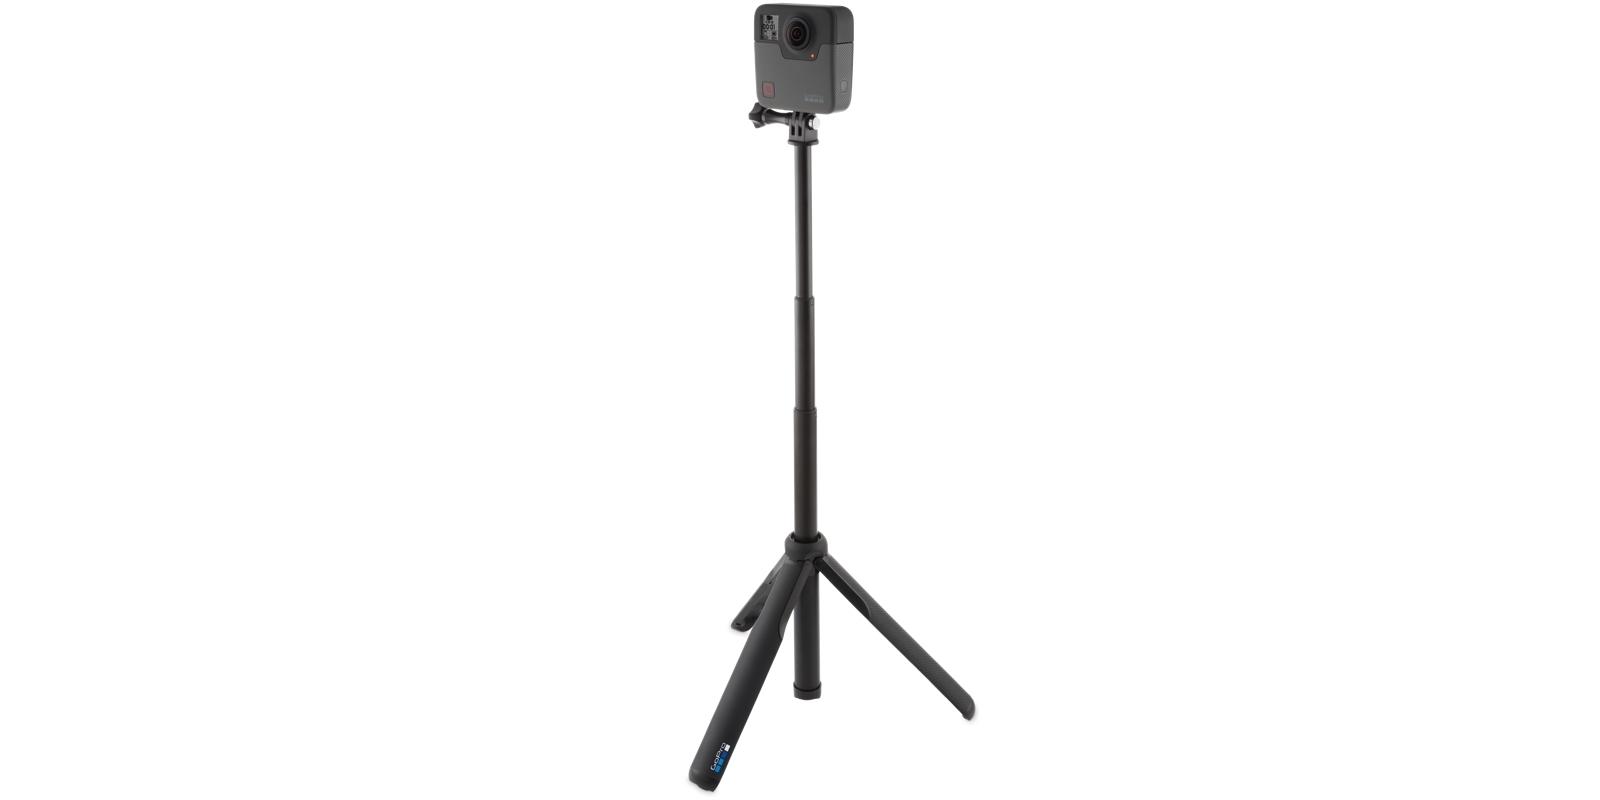 Панорамная камера GoPro Fusion 360 (CHDHZ-103) на штативе